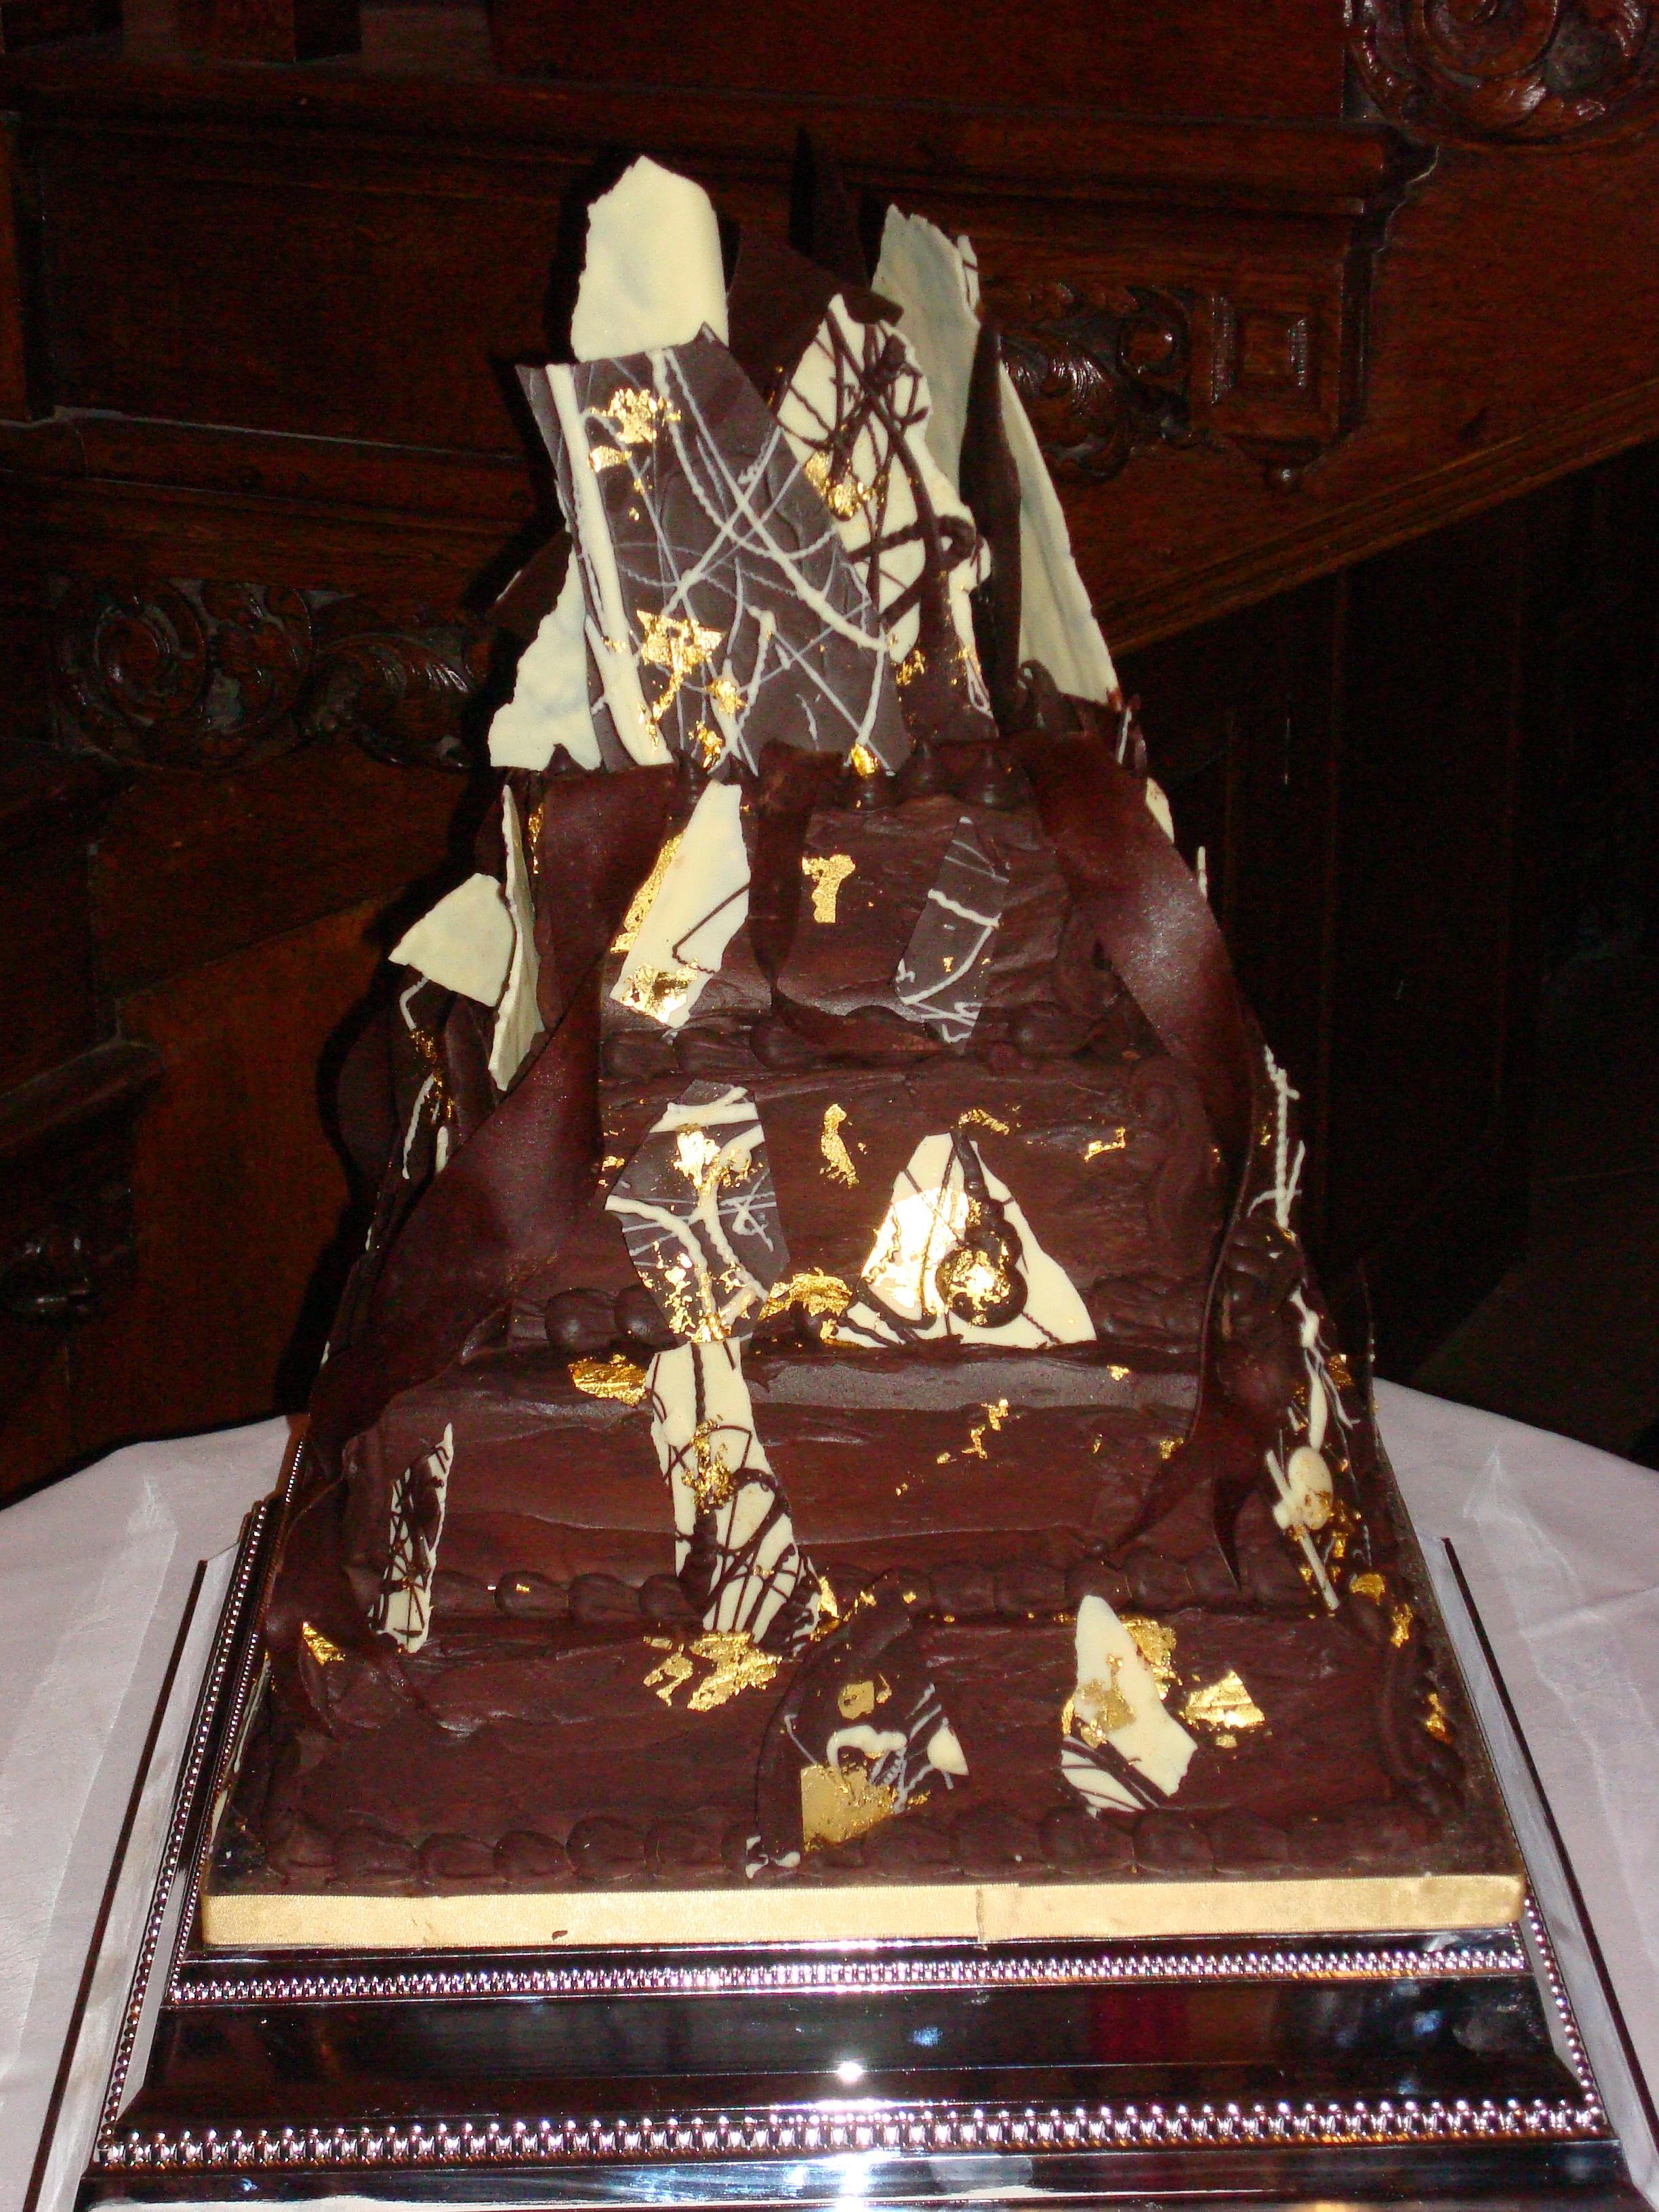 Tiered cake recipe